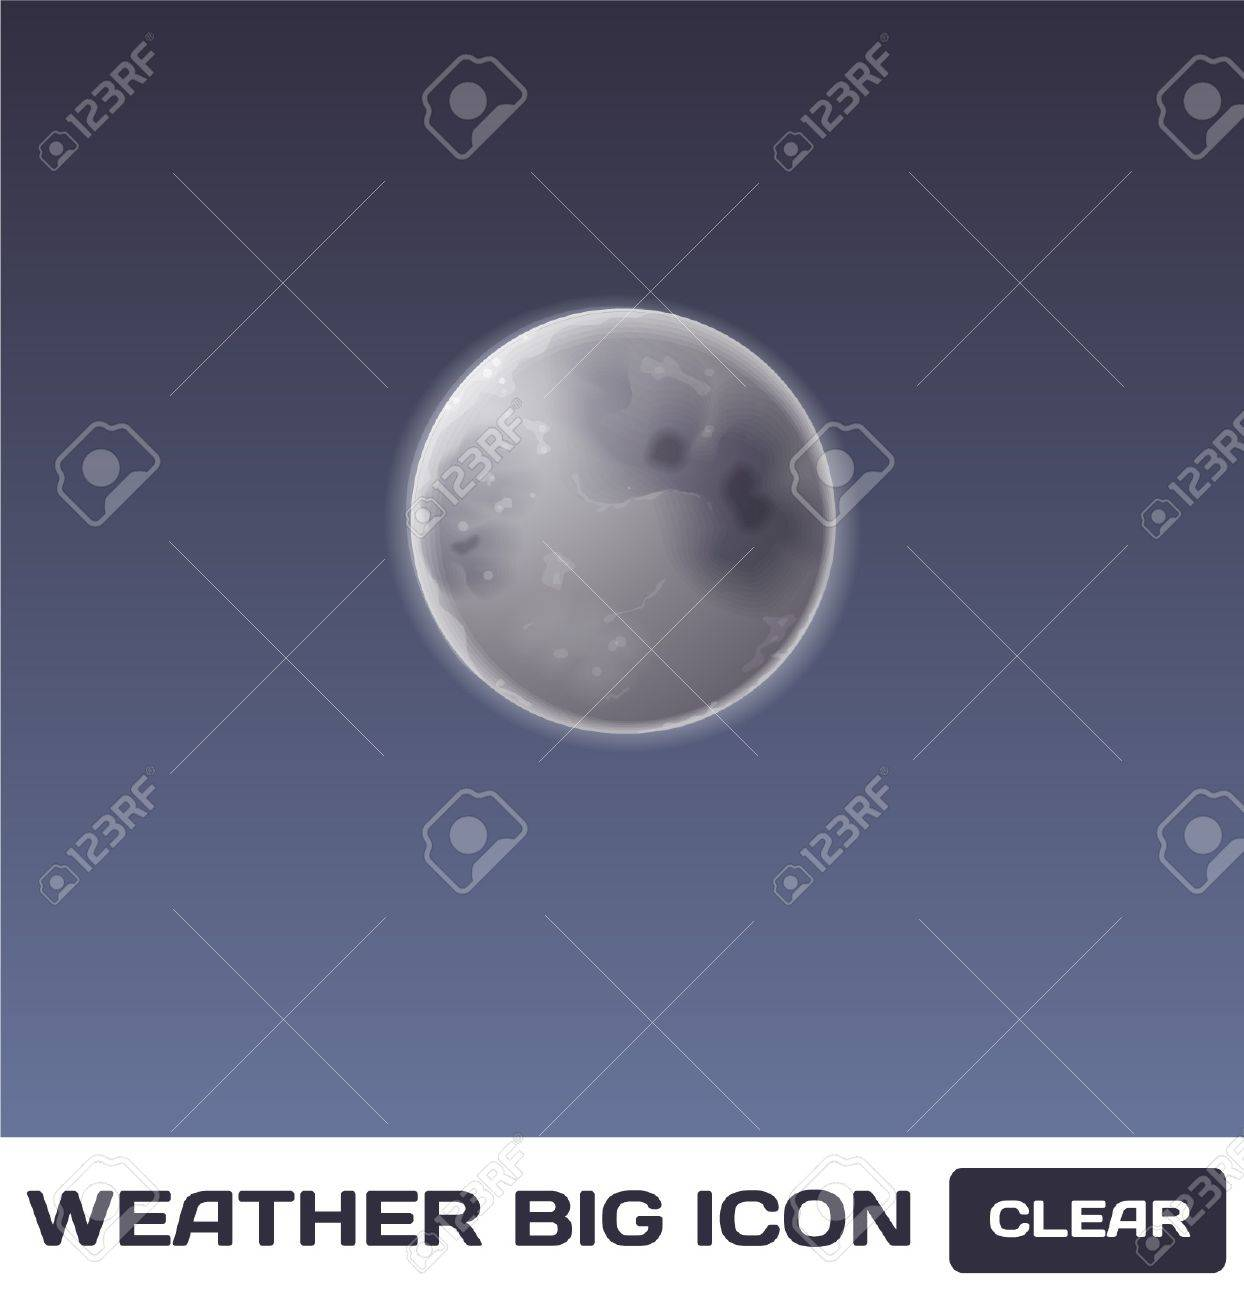 Big Icon Stock Vector - 16872910